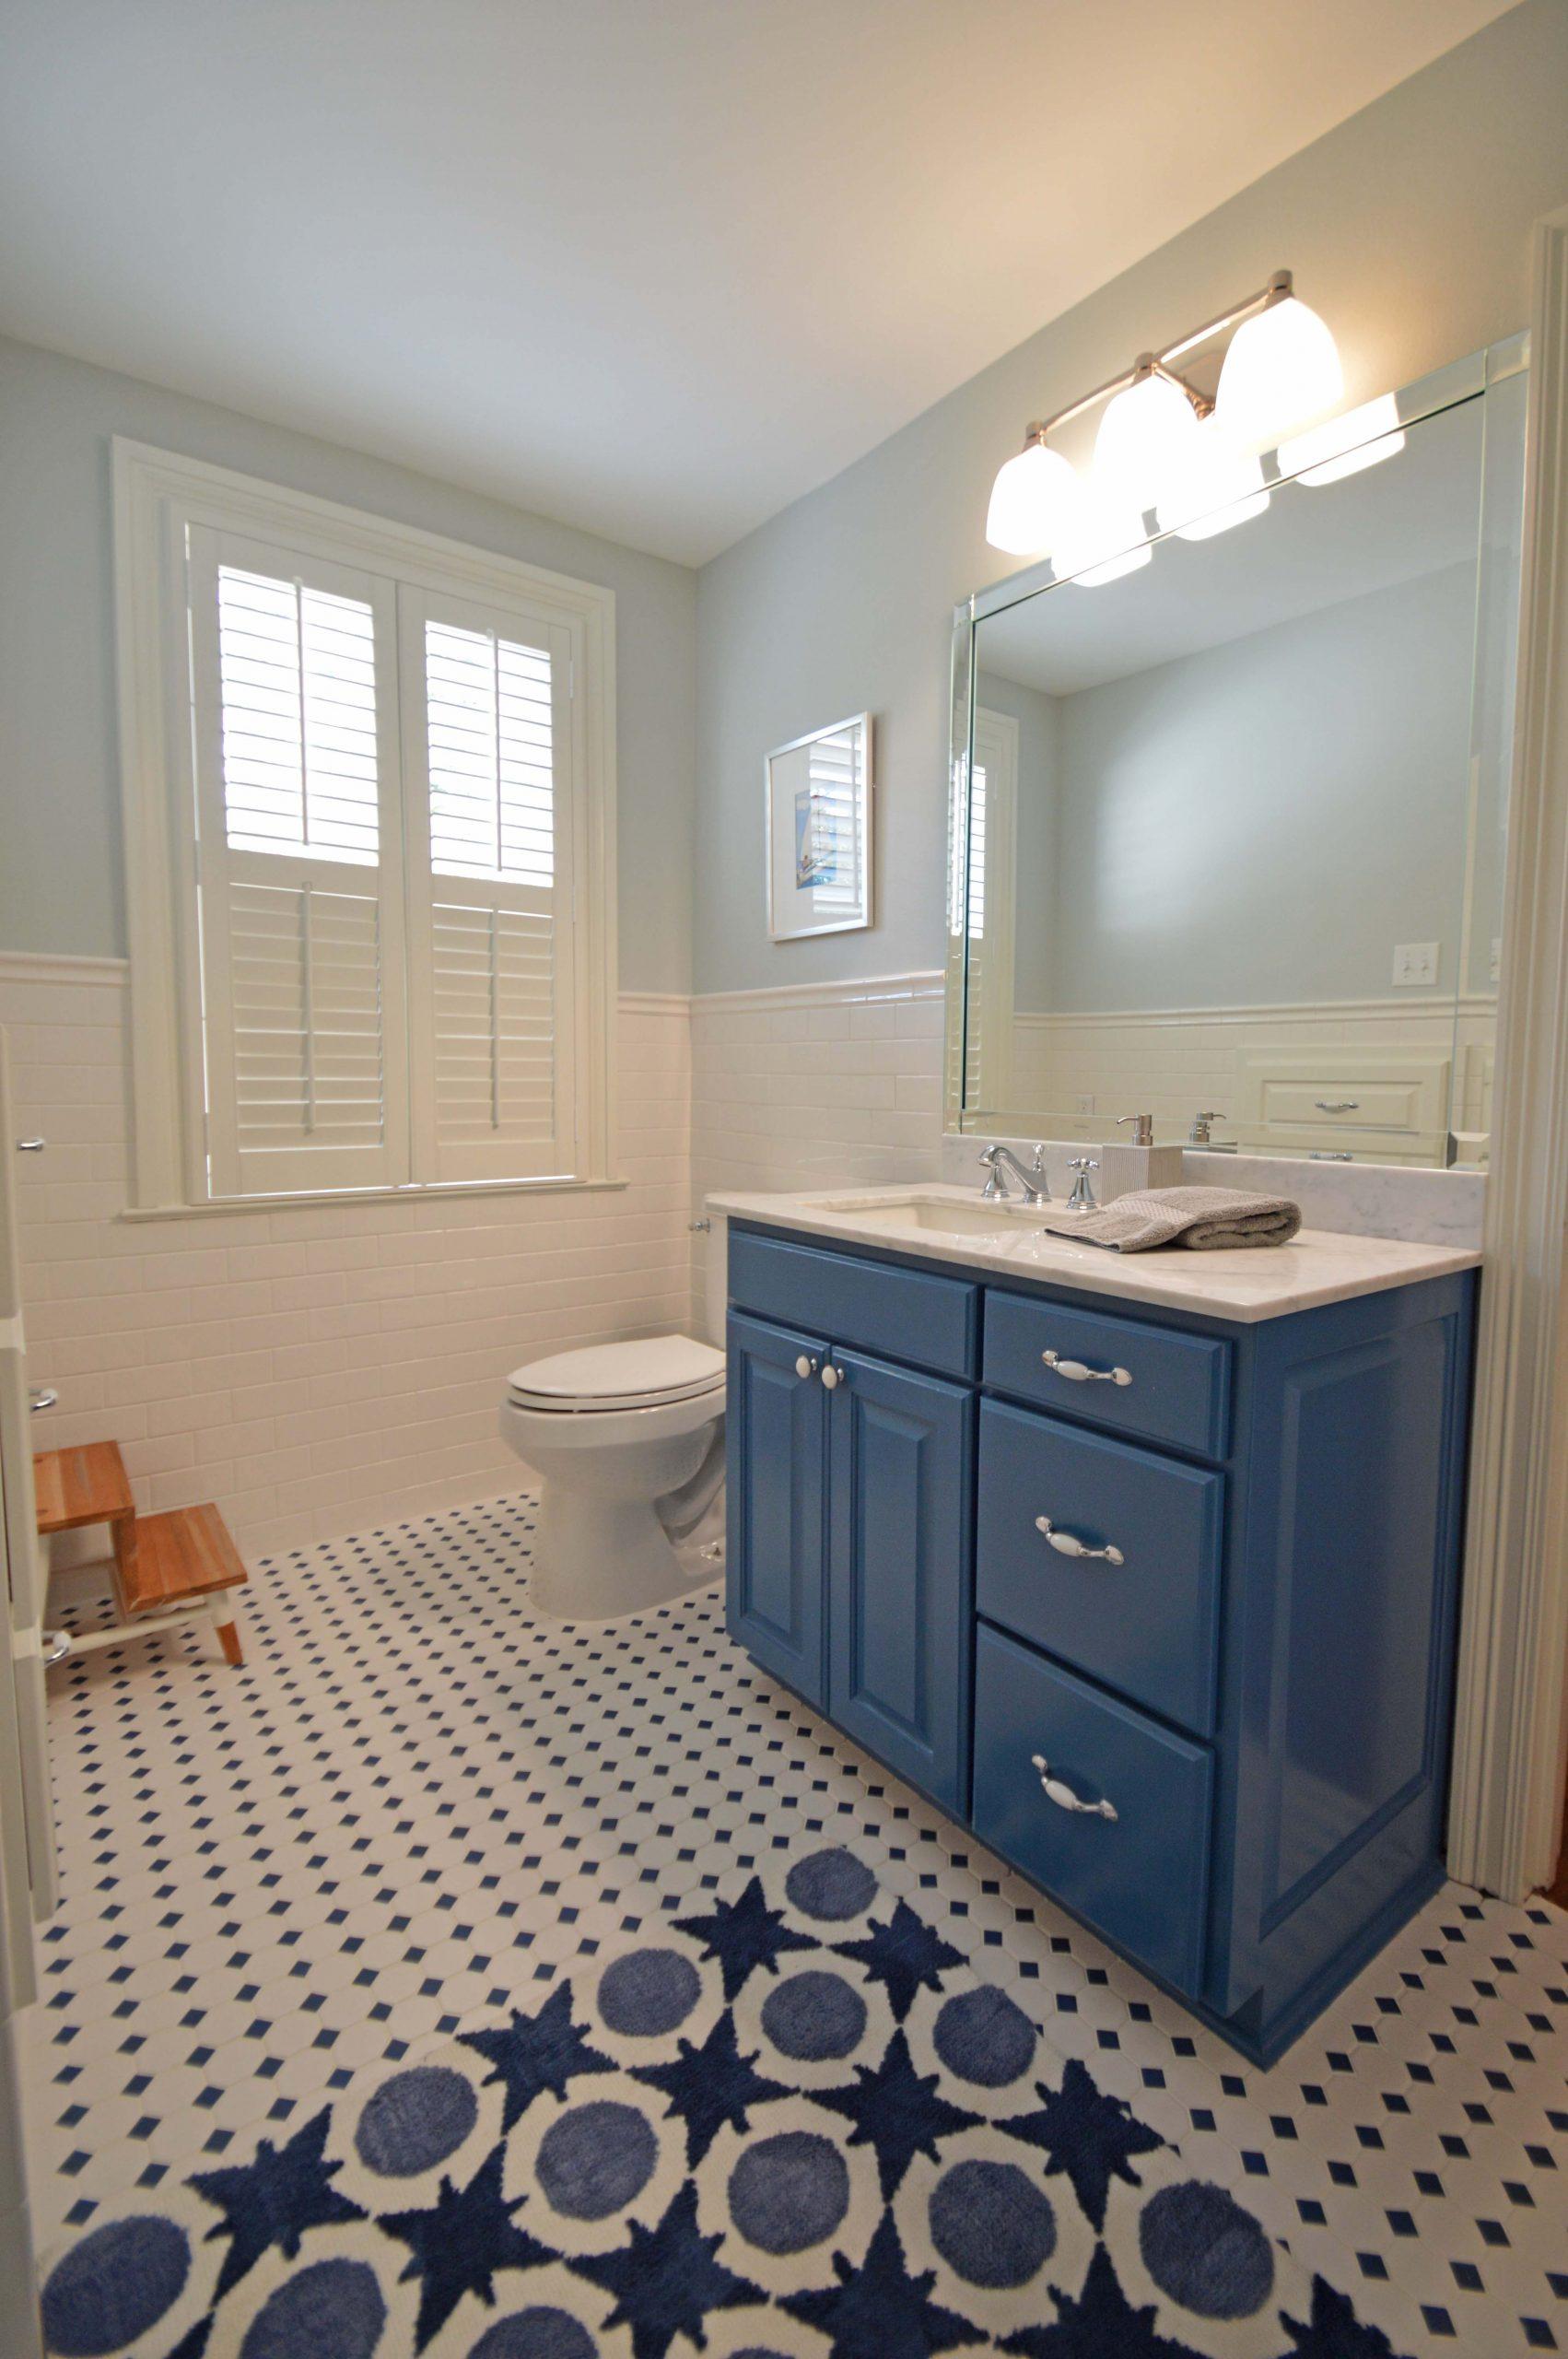 maranto-david-dixon-smith-interiors-baton-rouge-interior-design-custom-furniture-web-0007